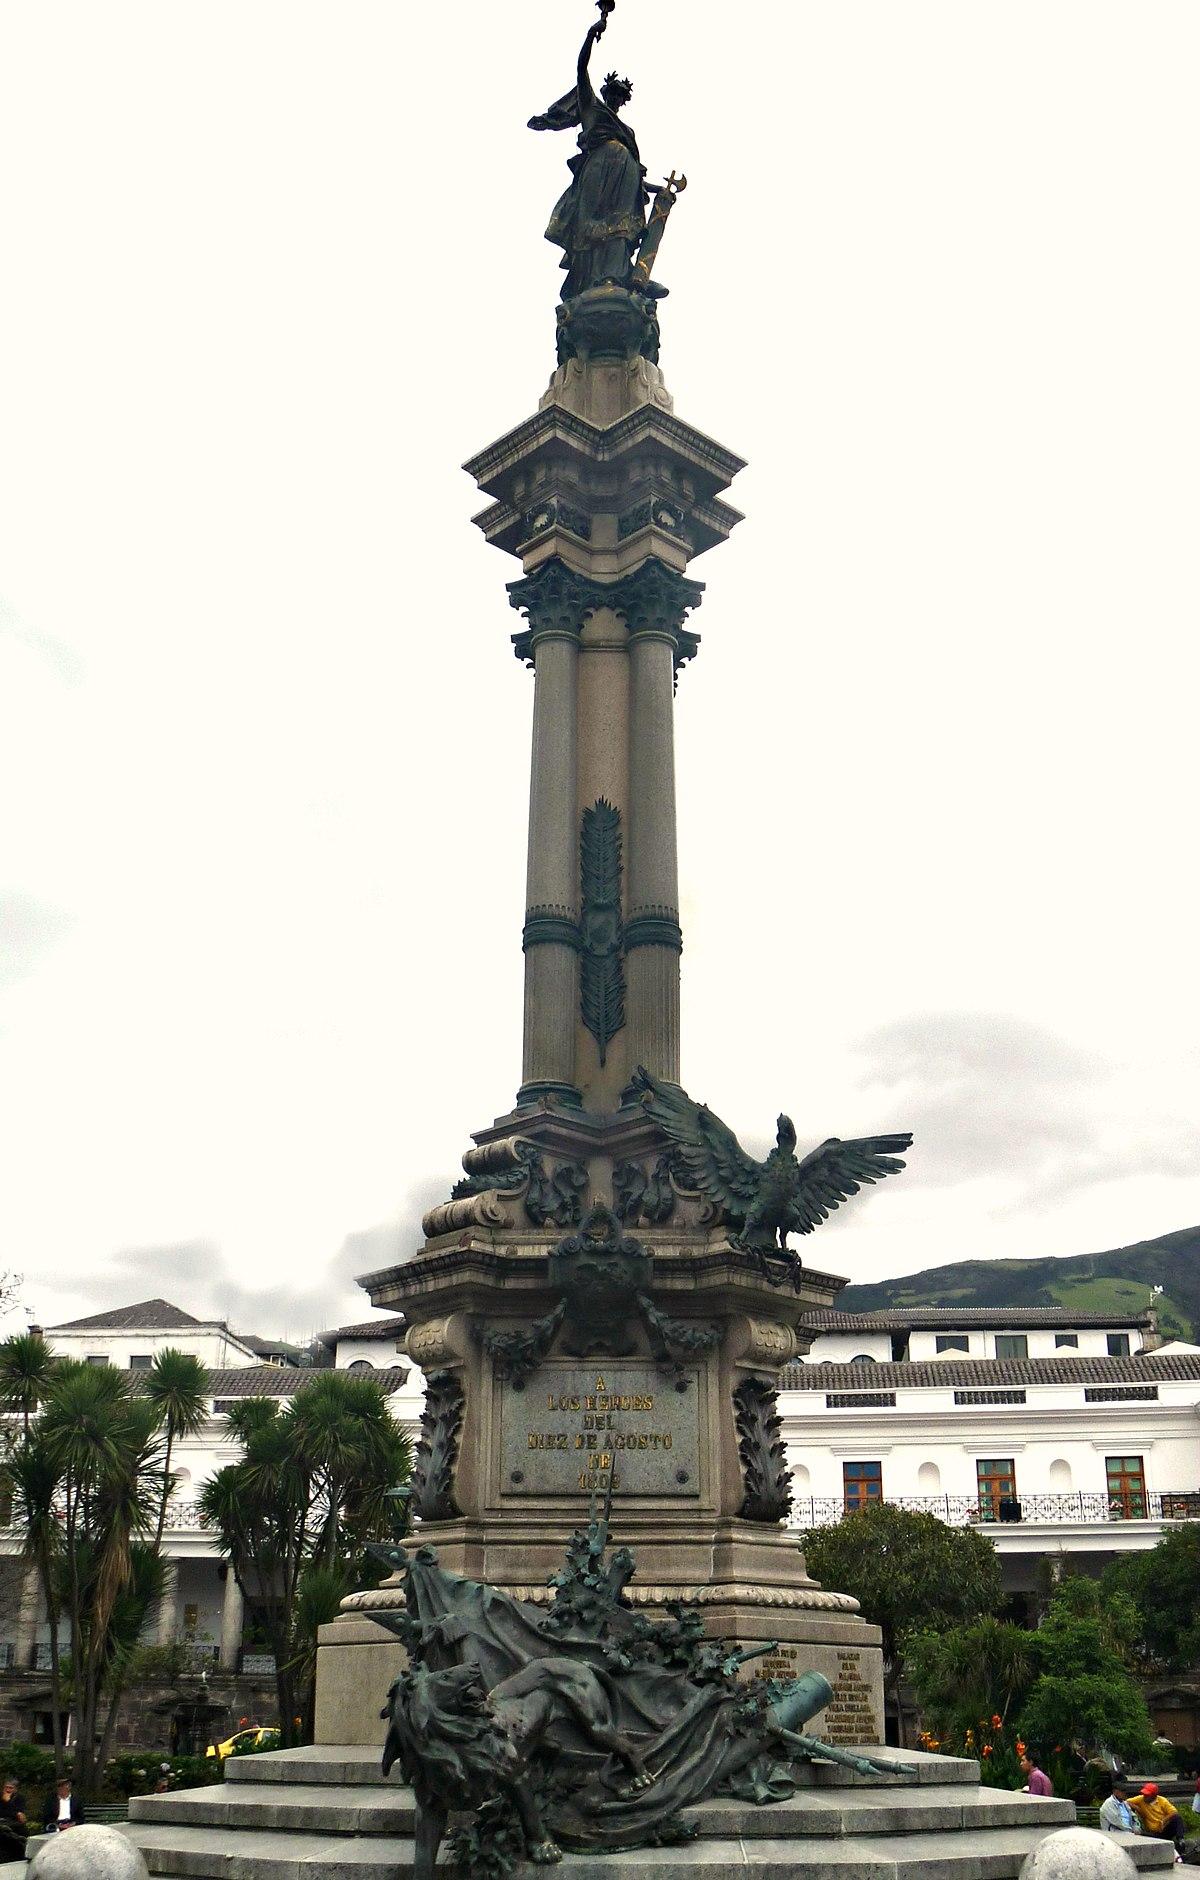 Monumento a la Independencia (Quito) - Wikipedia, la enciclopedia libre